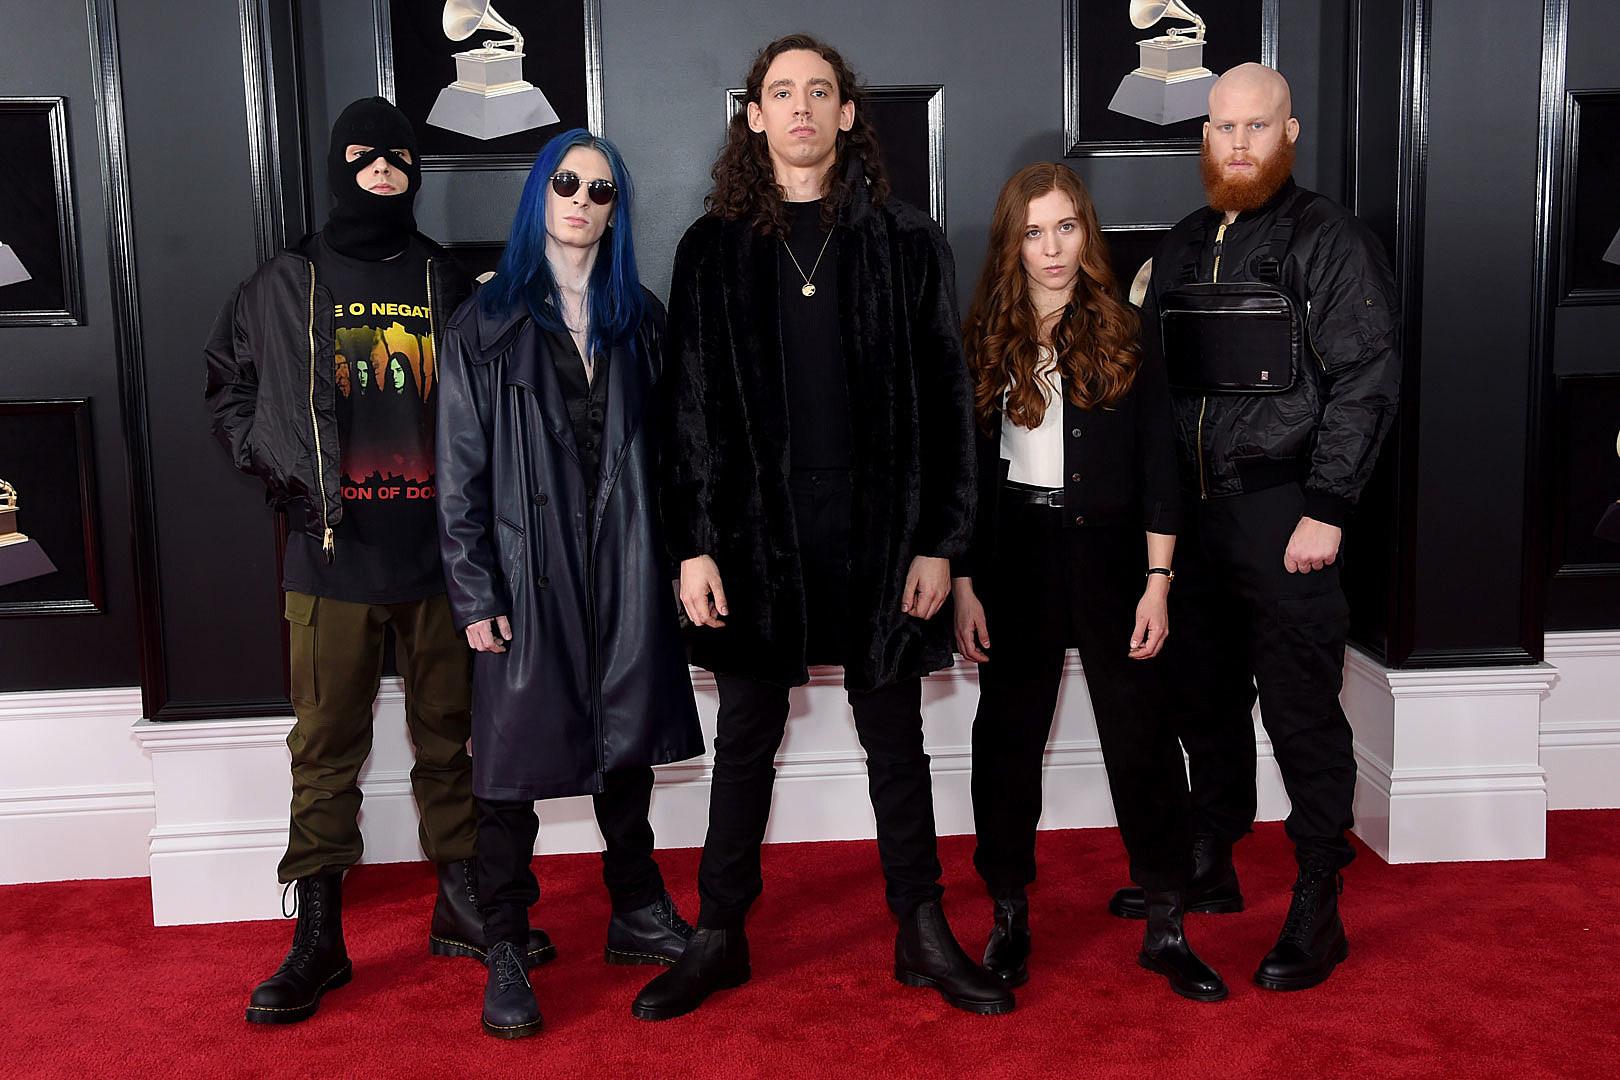 Code Orange Announce 'The New Reality' North American Headline Tour